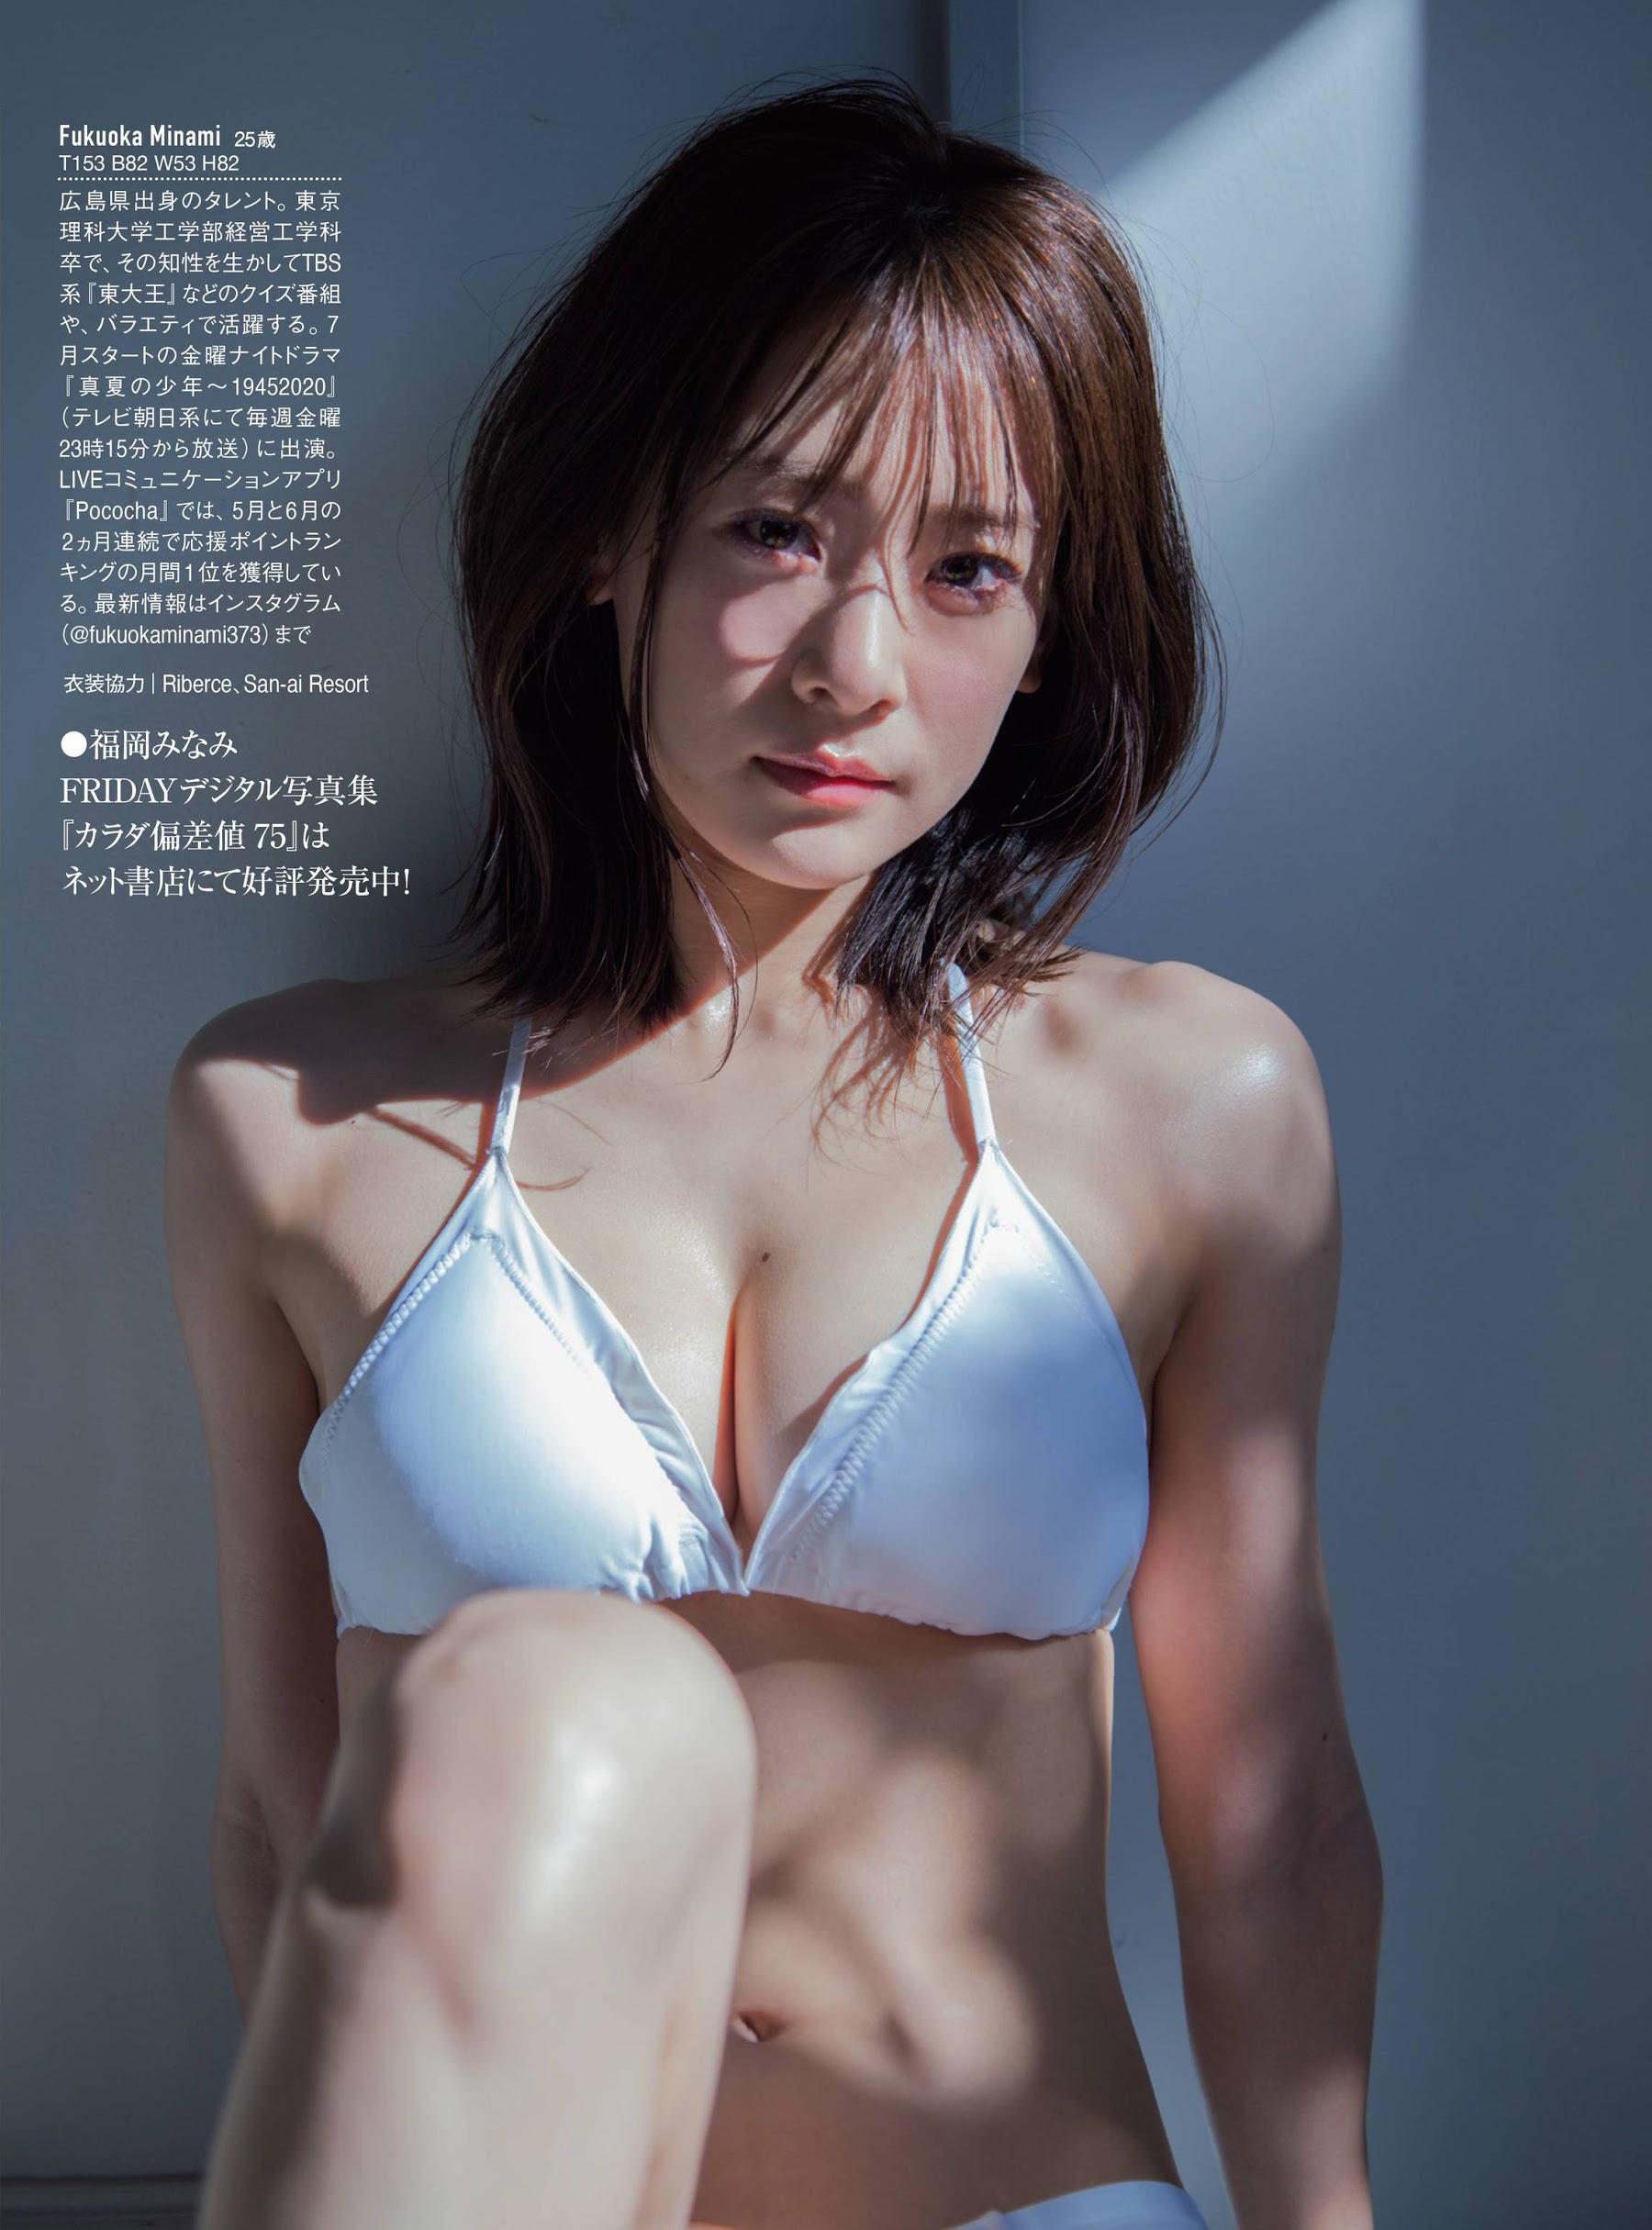 Newcomer in the gravure world who graduated from Tokyo University of Science Minami Fukuoka Swimsuit gravure bikini beauty BODY Rikejo 2020004